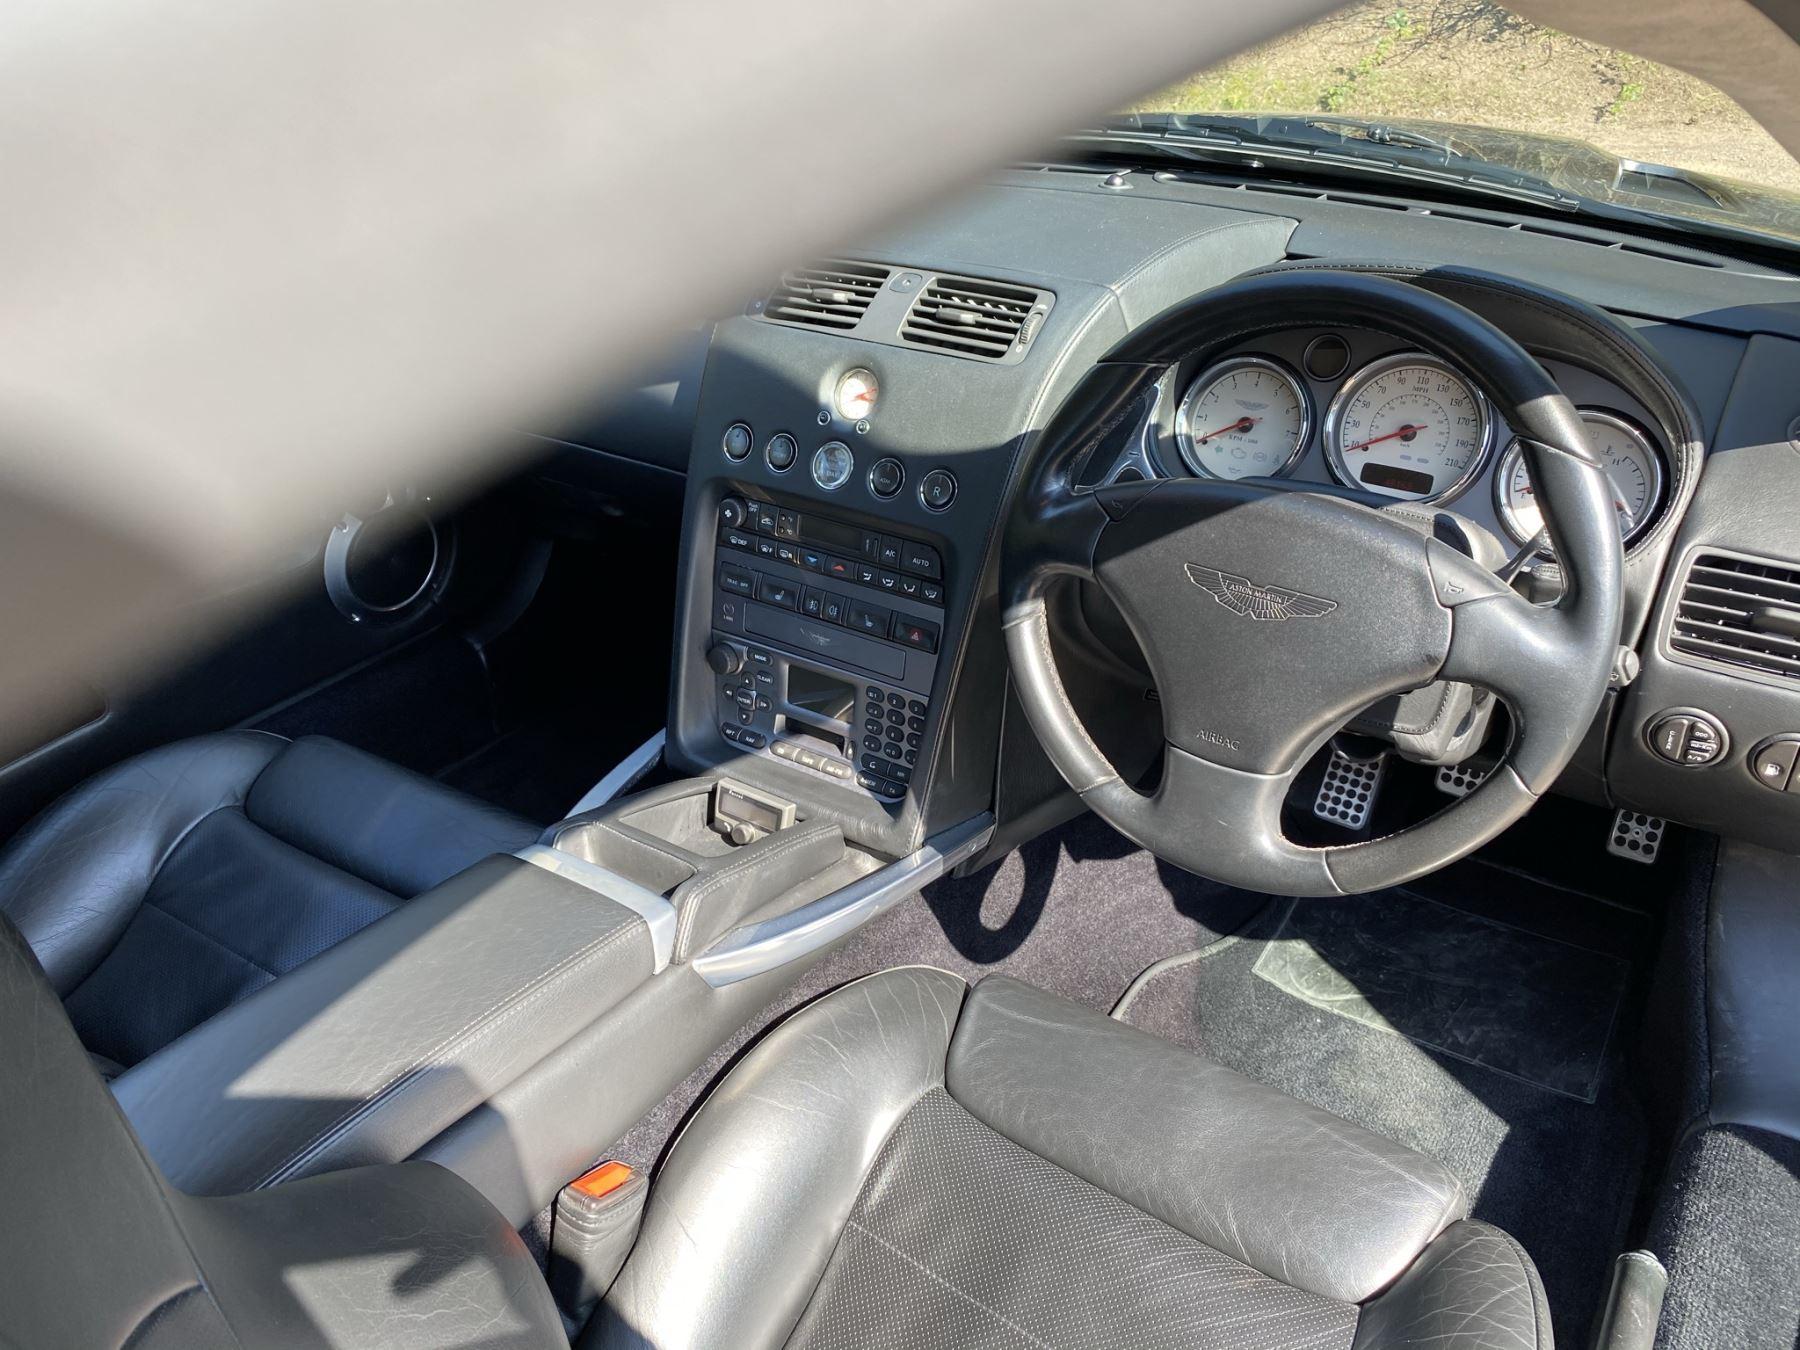 Aston Martin Vanquish S S V12 2+2 2dr image 18